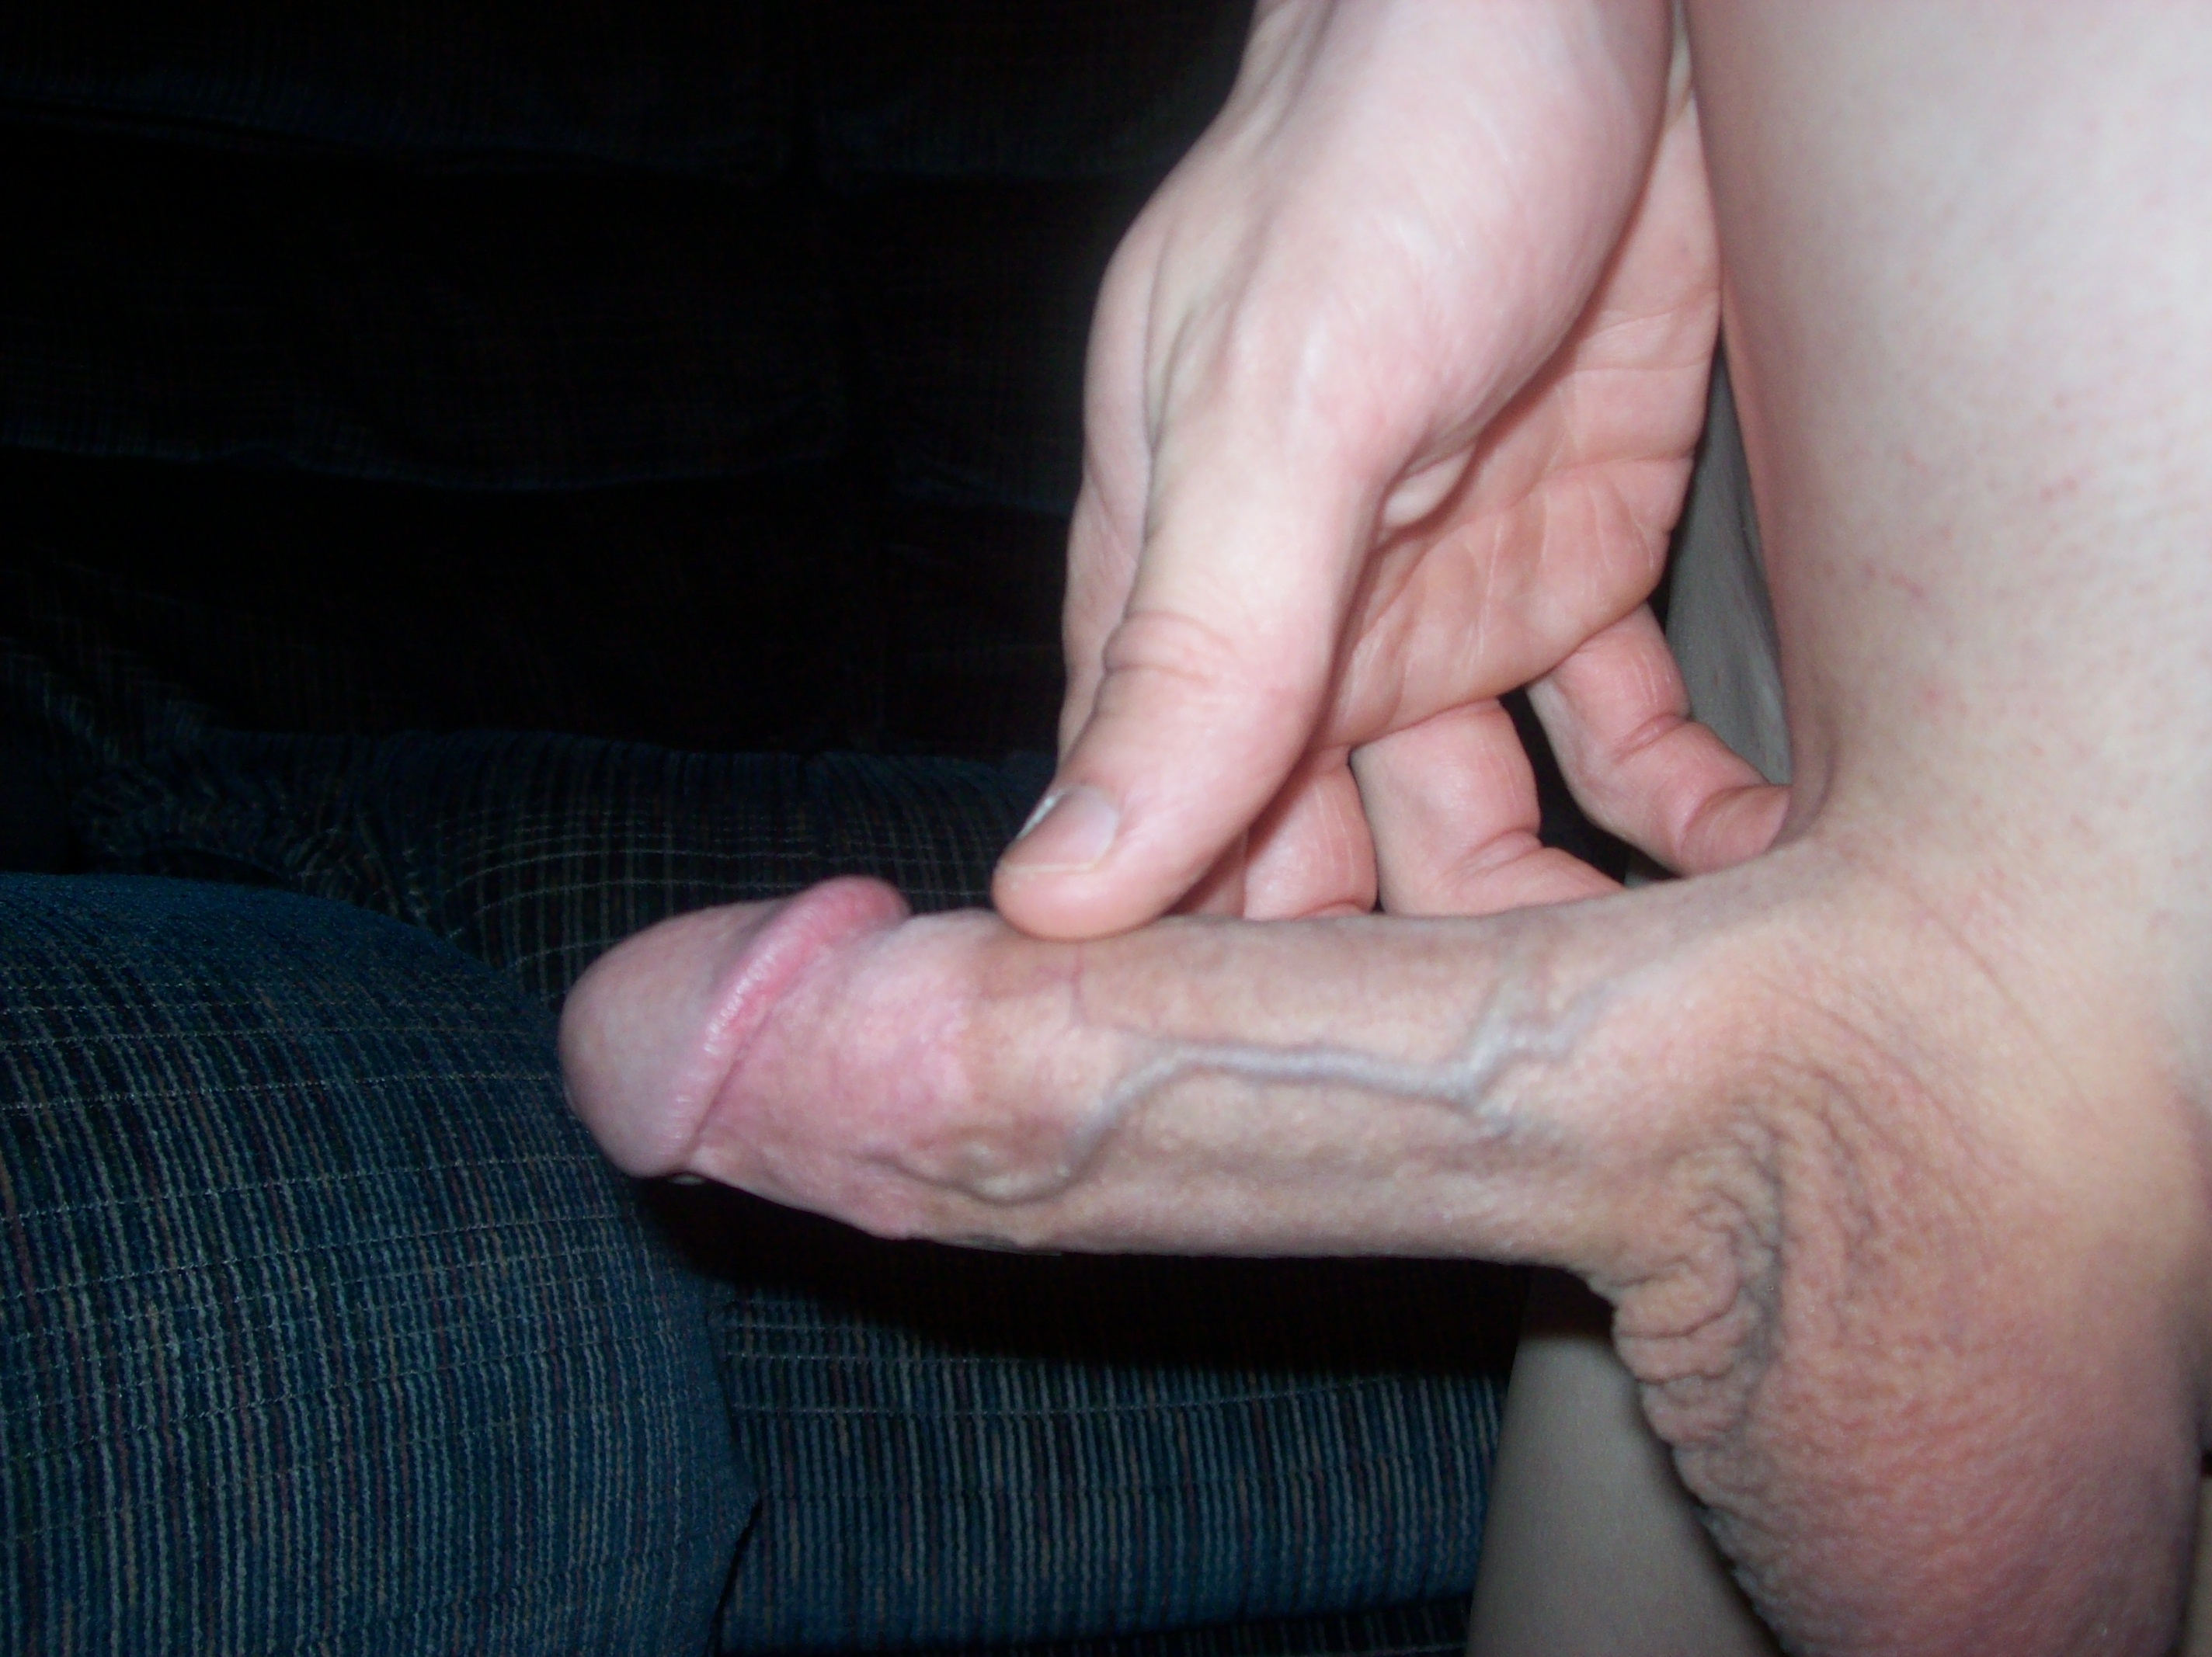 male ejaculating cocks